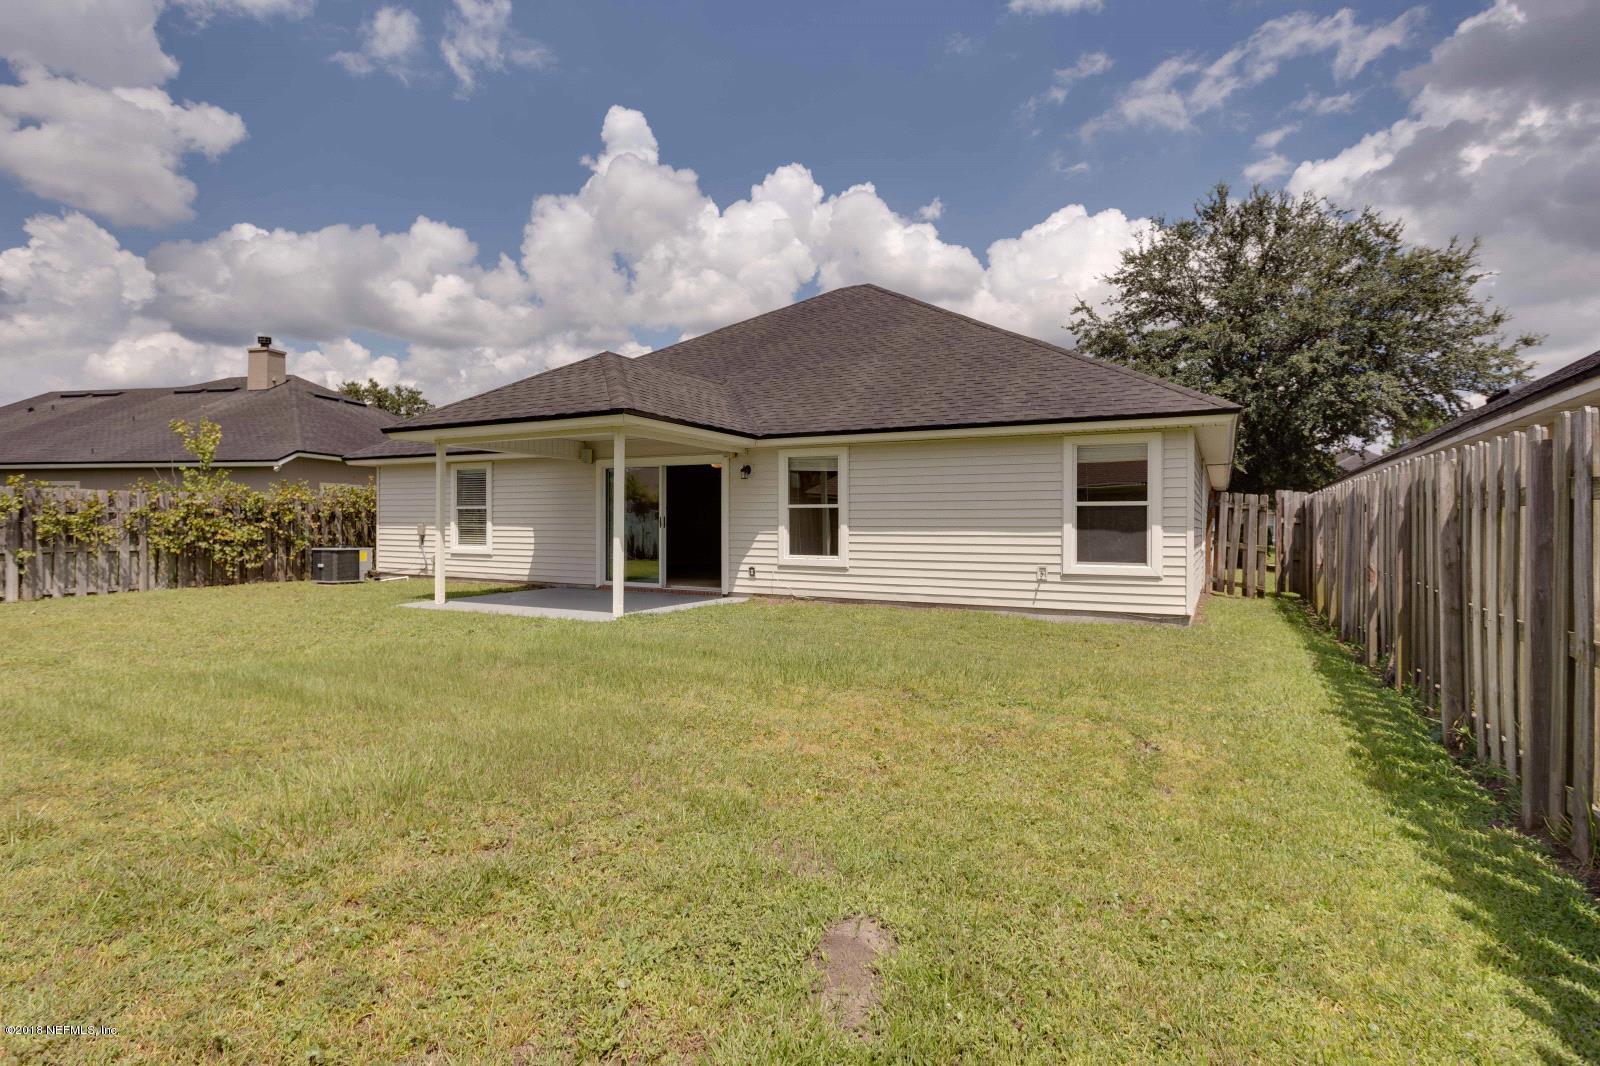 1449 CANOPY OAKS, ORANGE PARK, FLORIDA 32065, 3 Bedrooms Bedrooms, ,2 BathroomsBathrooms,Residential - single family,For sale,CANOPY OAKS,957262